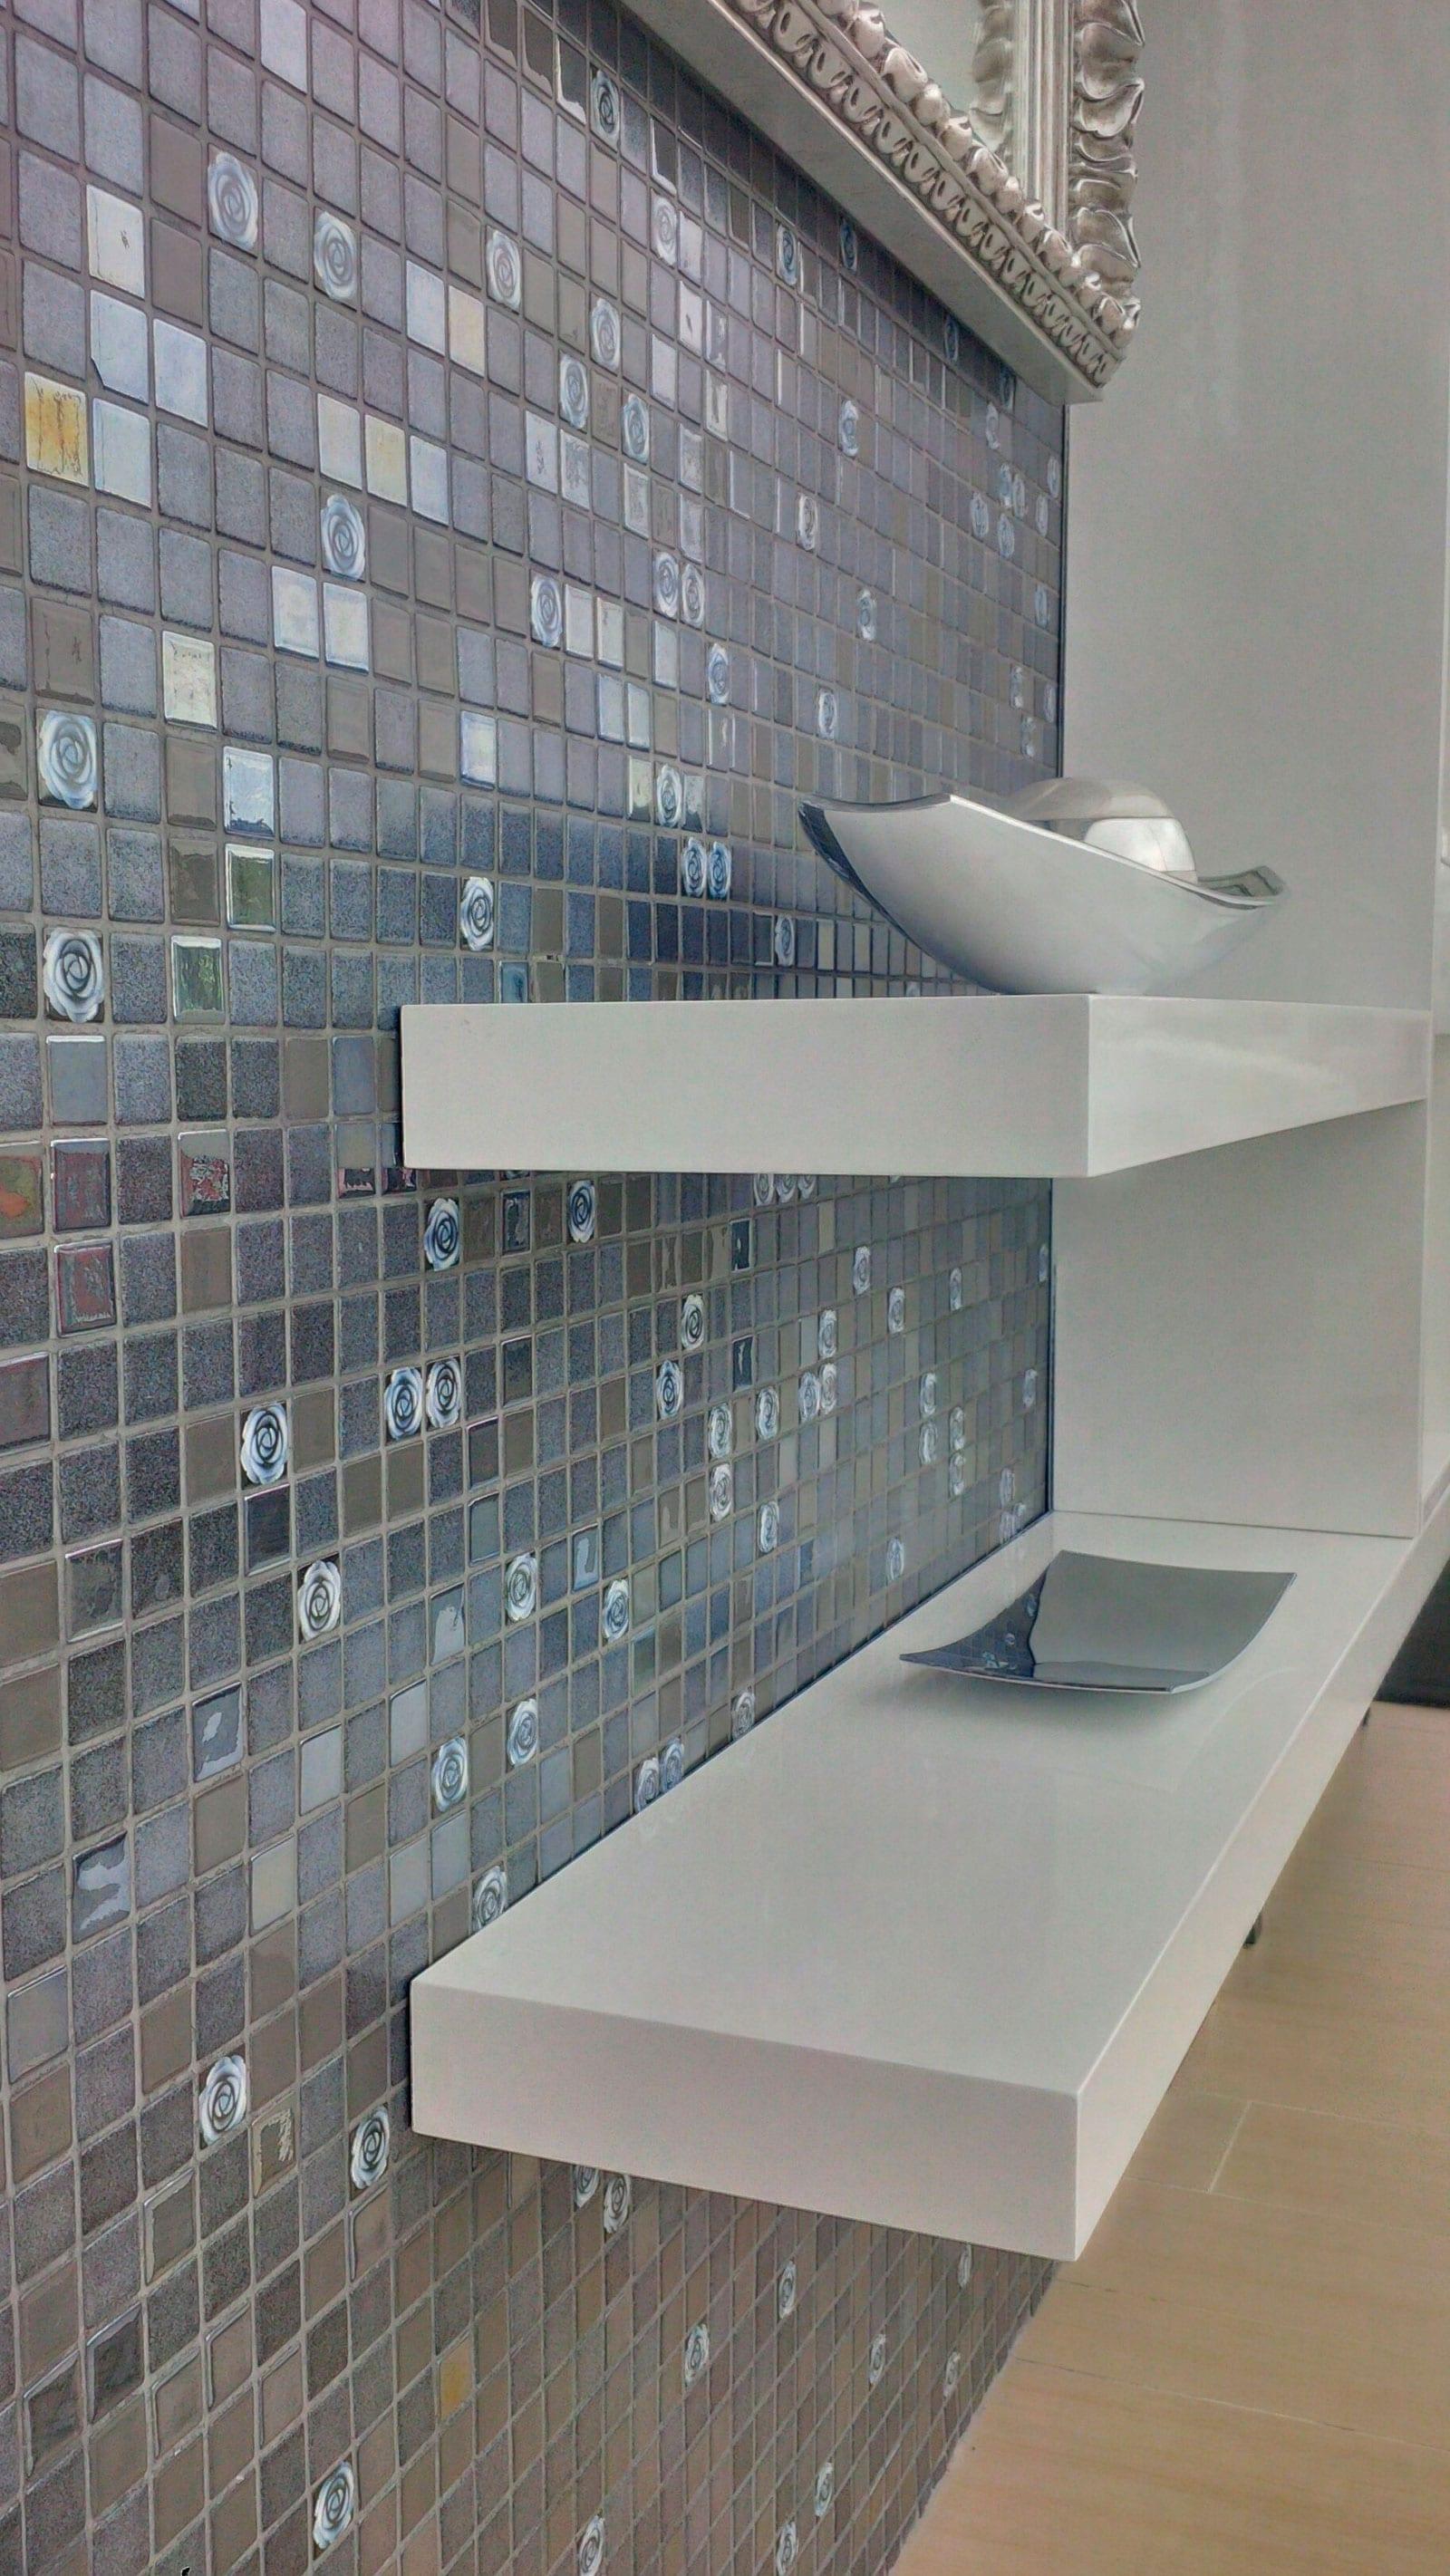 Мозаика Roses Topping (Испания, Ezarri) — отделка комнаты.